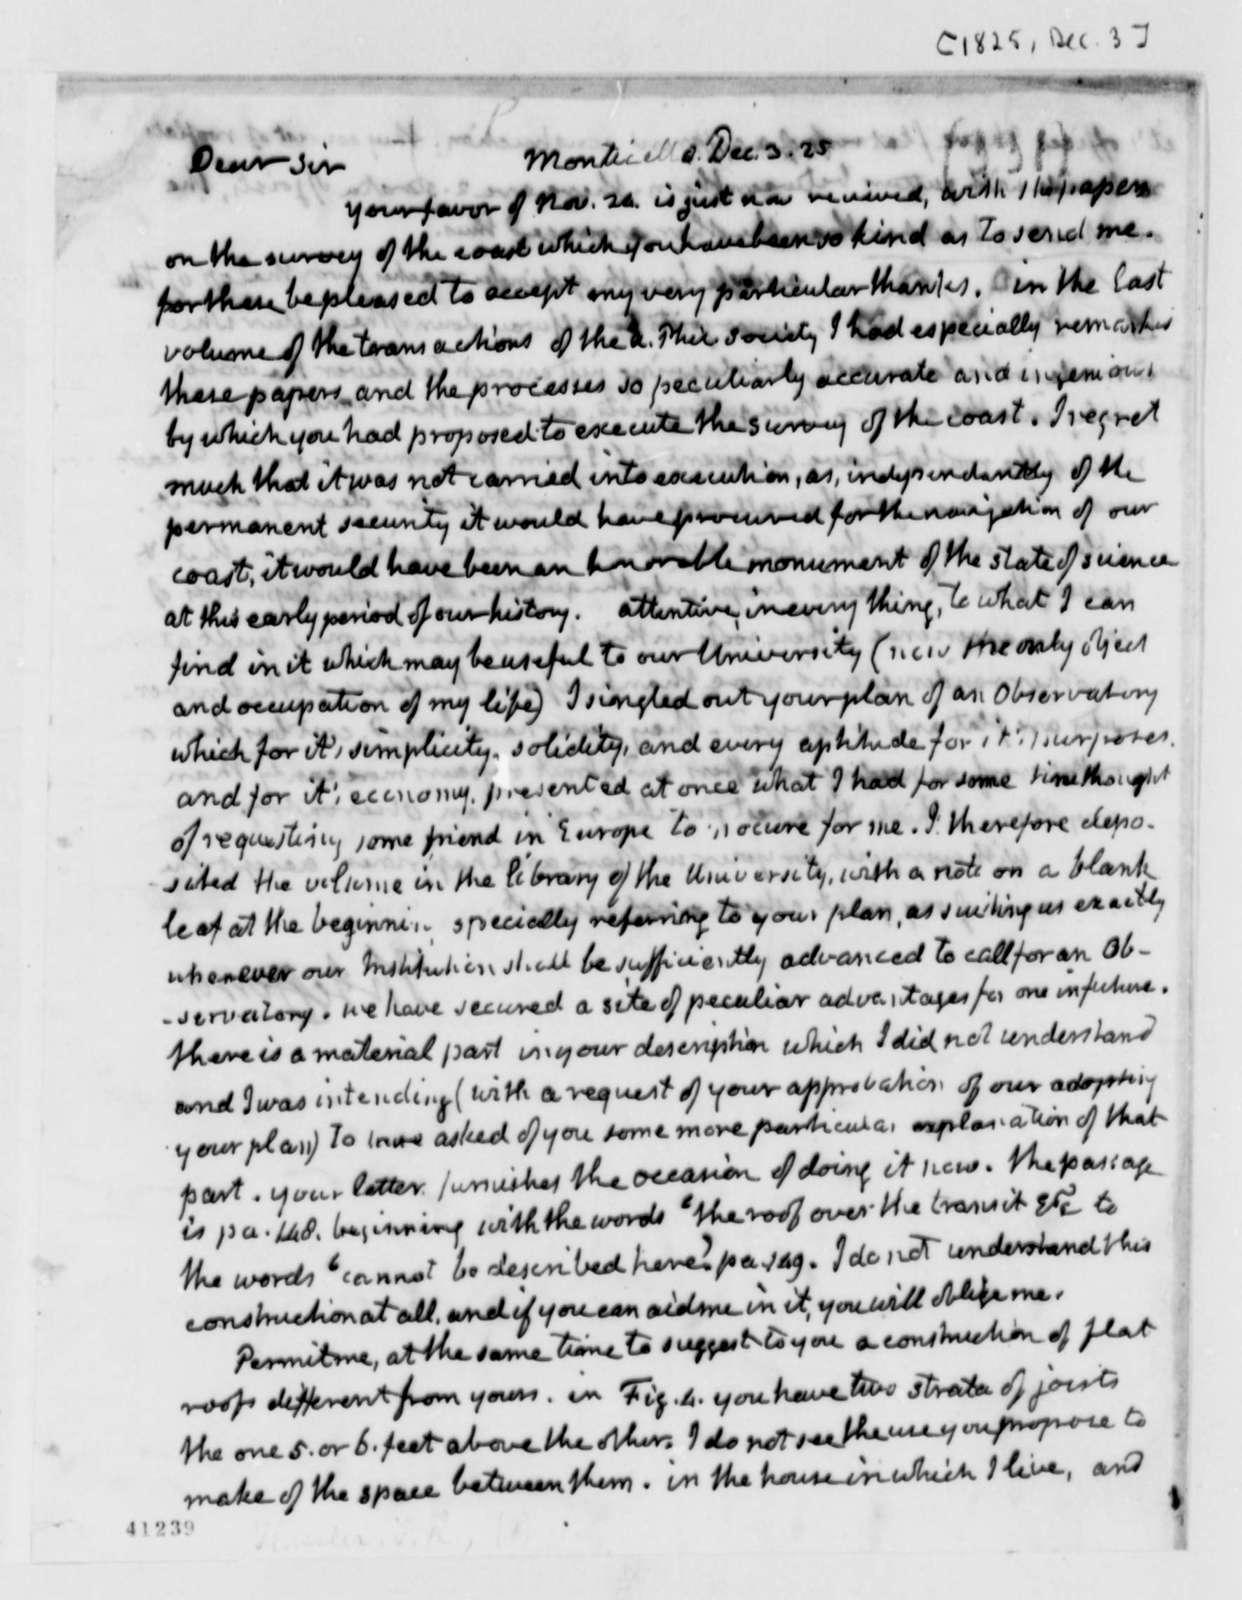 Thomas Jefferson to Ferdinand R. Hassler, December 3, 1825